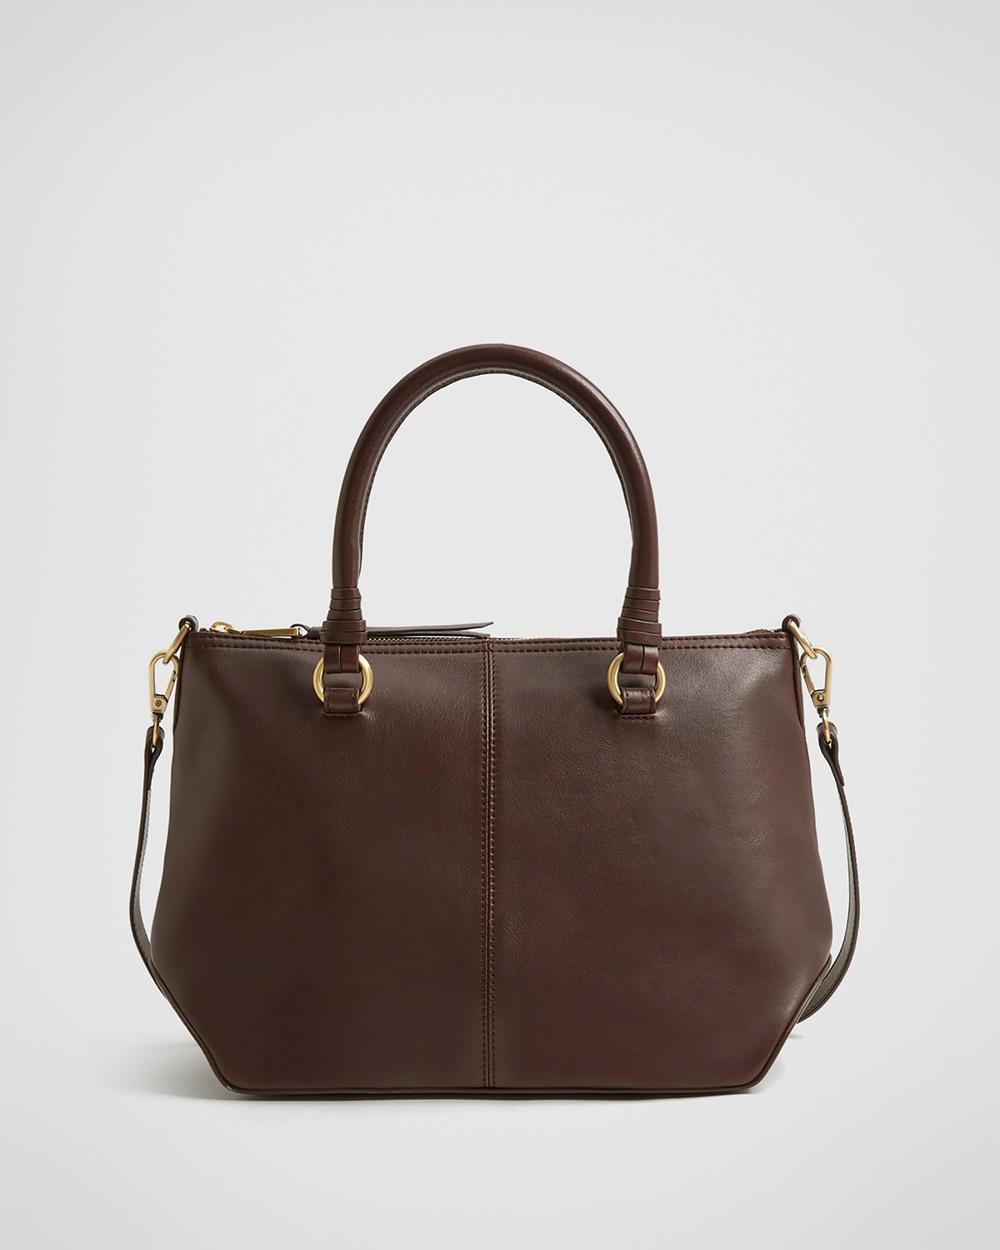 Witchery Marcella Soft Barrel Bag Bags brown Australia